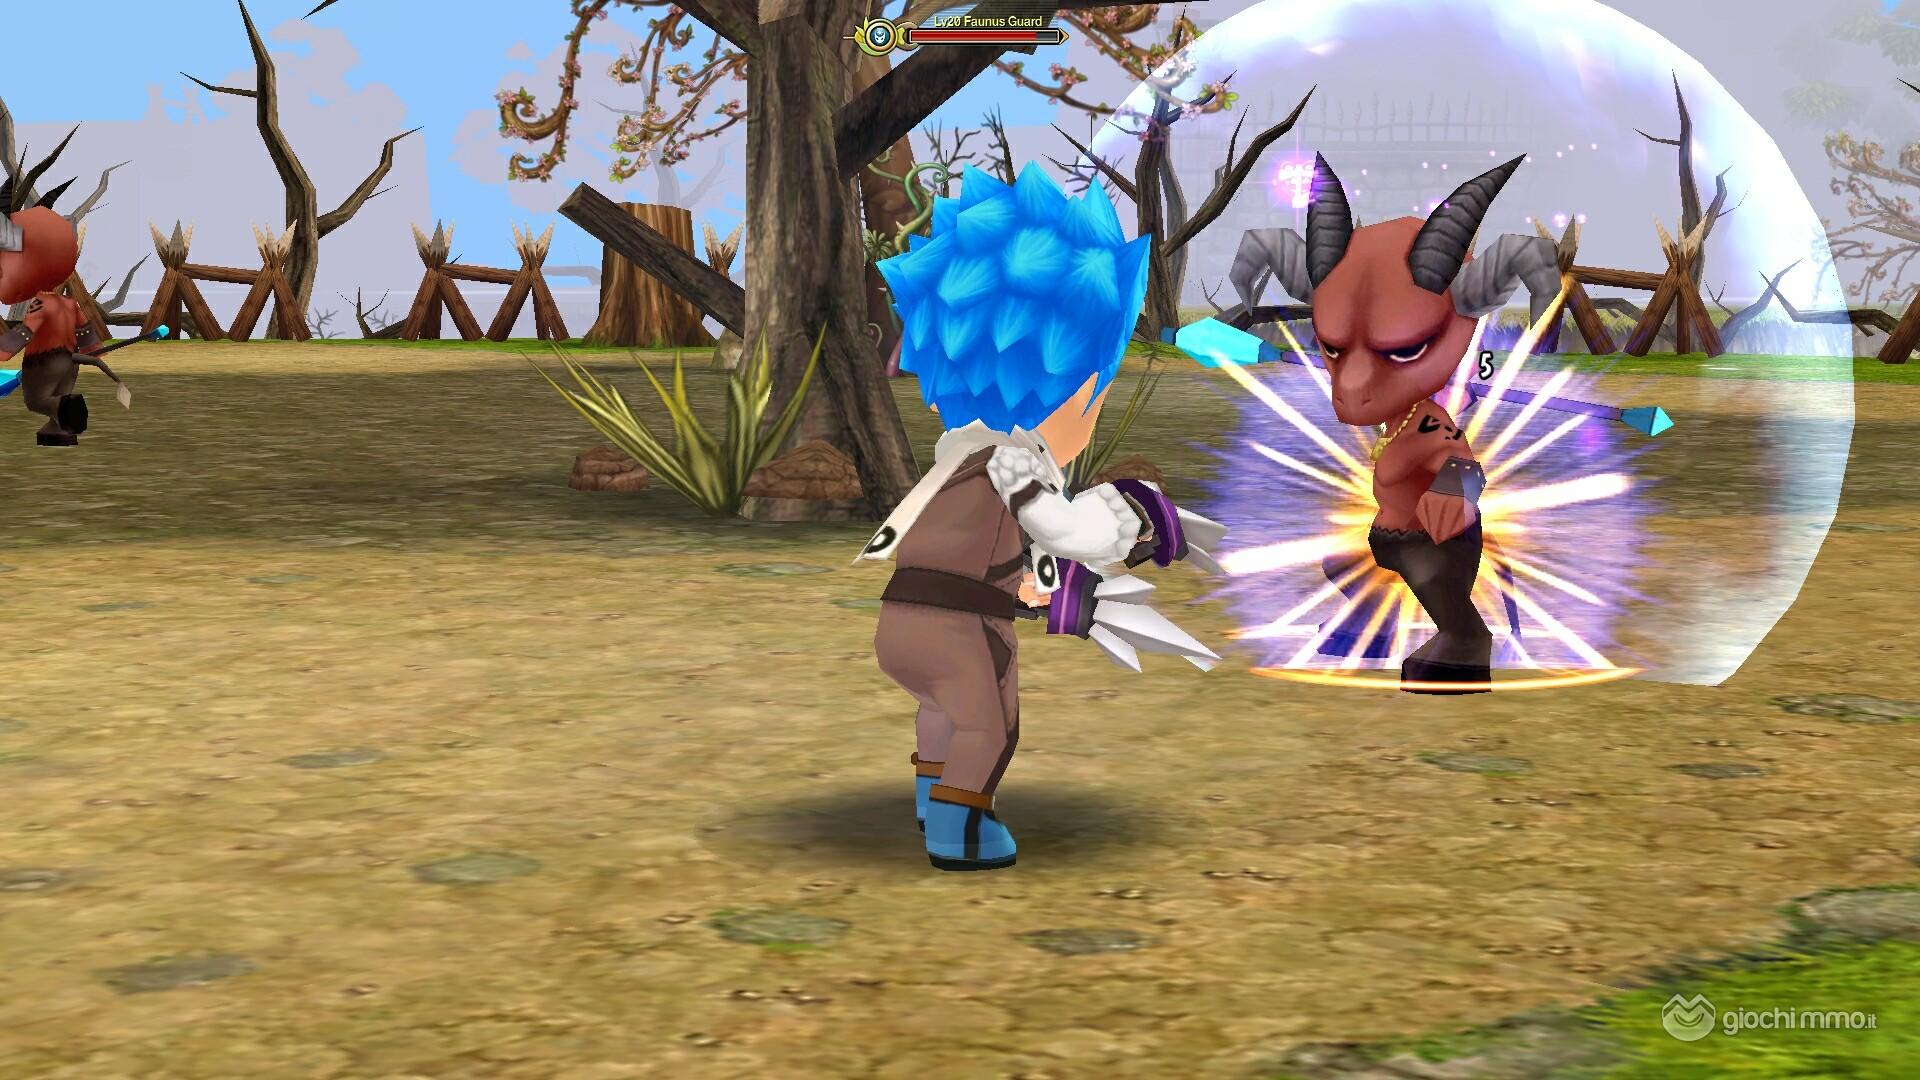 Clicca sull'immagine per ingrandirlaNome: Legend of edda screen06.jpgVisite: 58Dimensione: 480.1 KBID: 8522